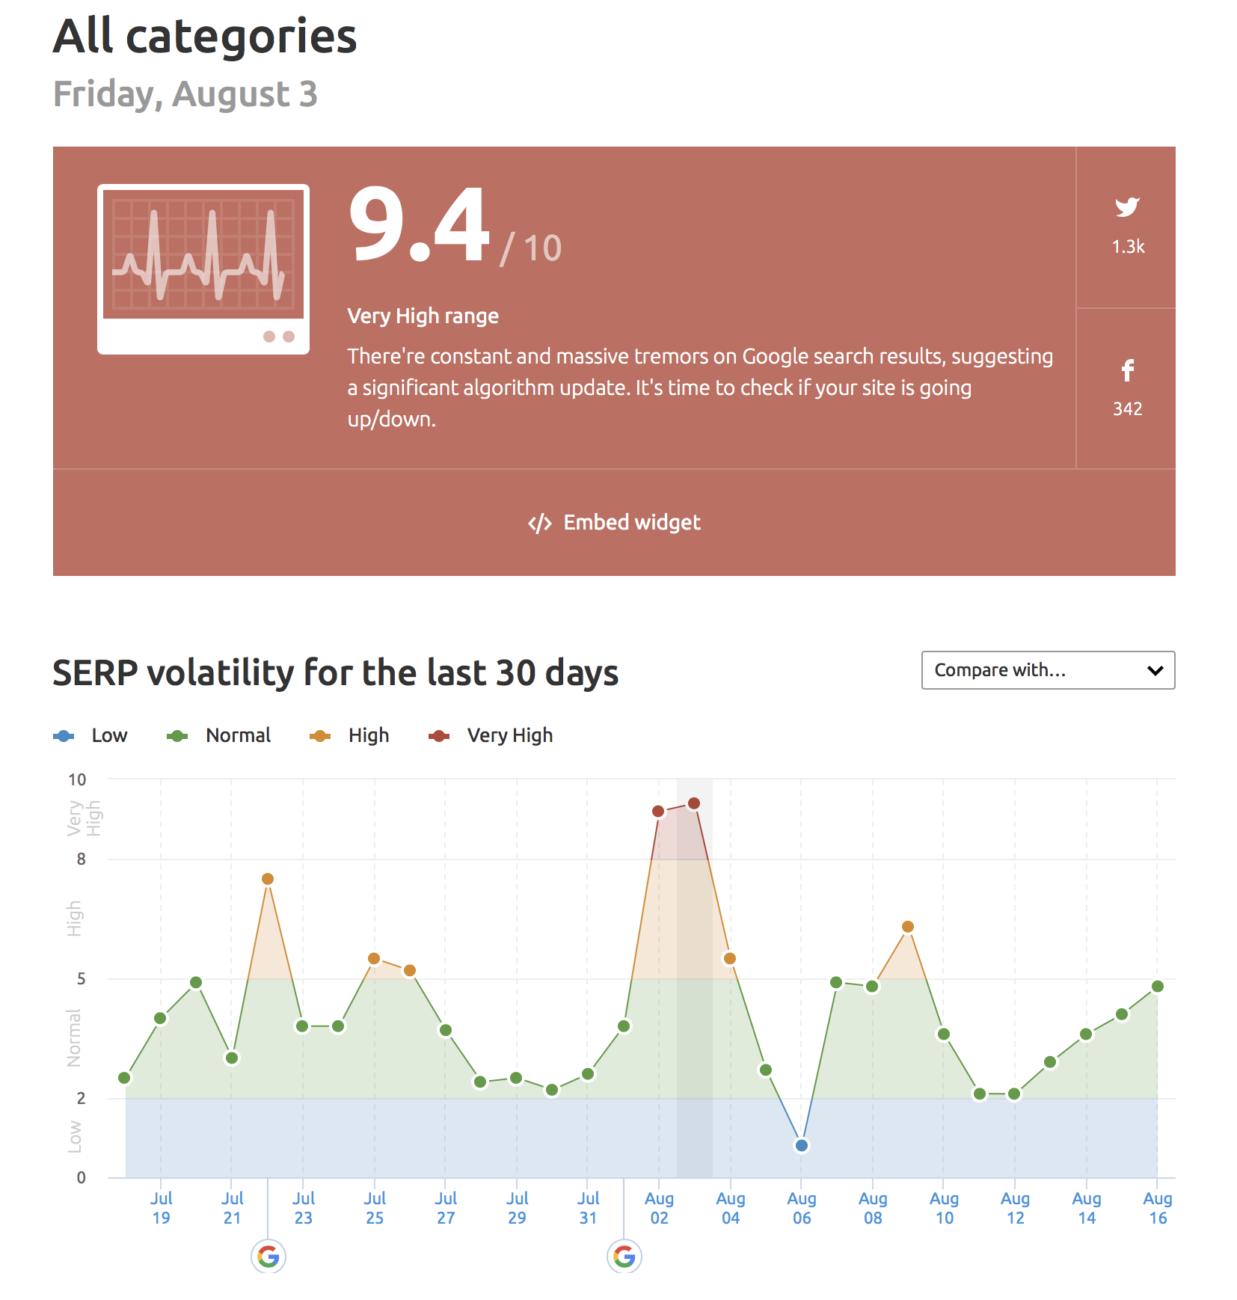 semrush graph showing sera volatility for the last 30 days